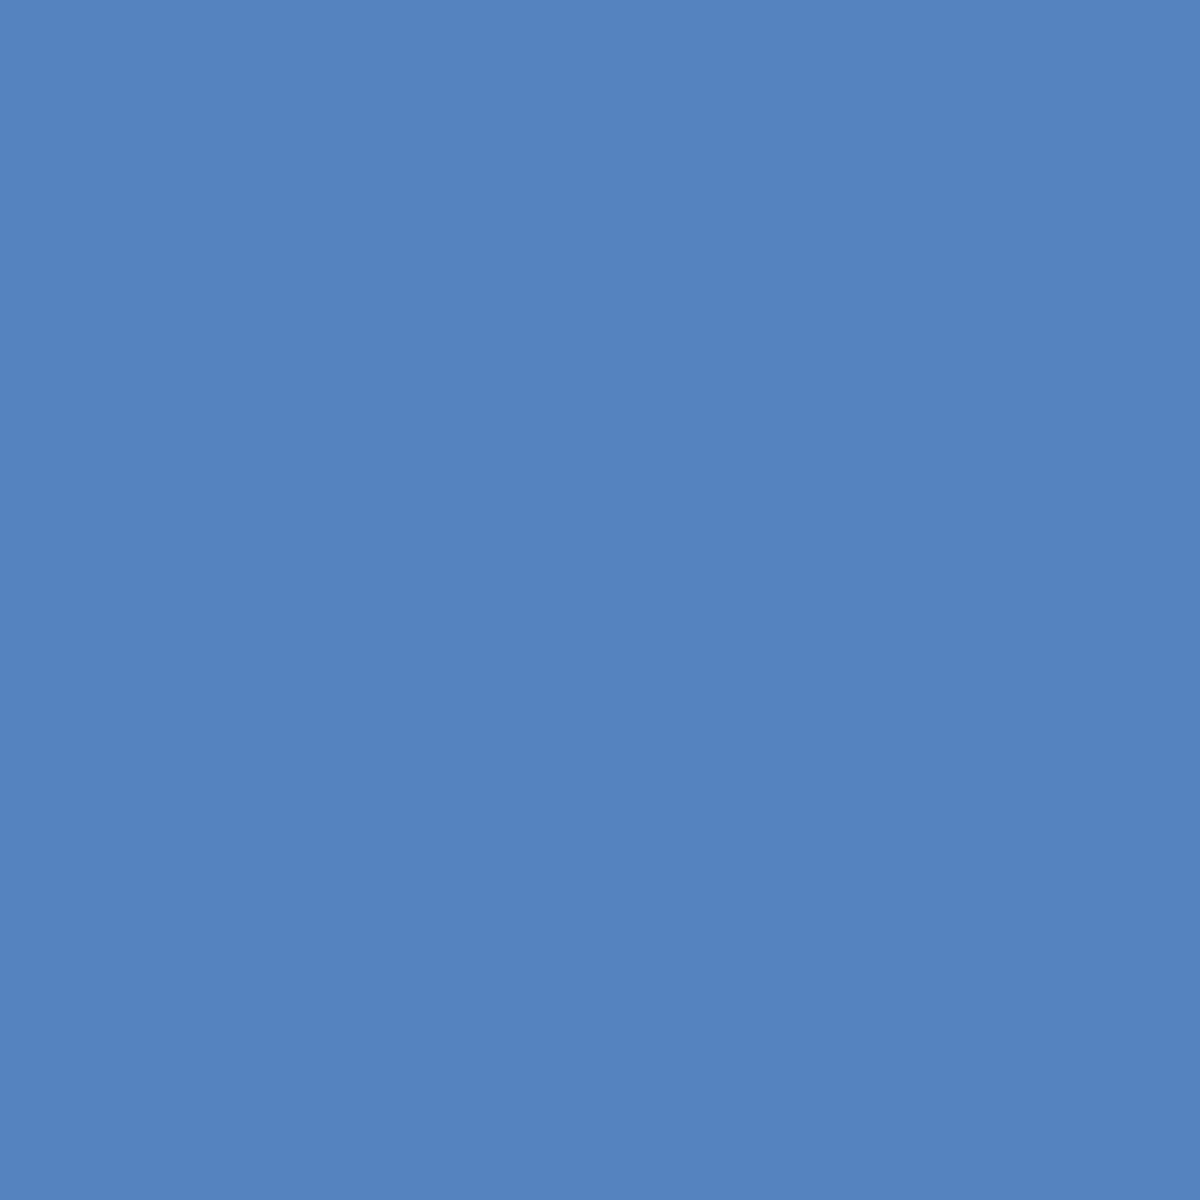 Керамогранит Almera Ceramica Rainbow GMM501 BLUE арт.(409670)